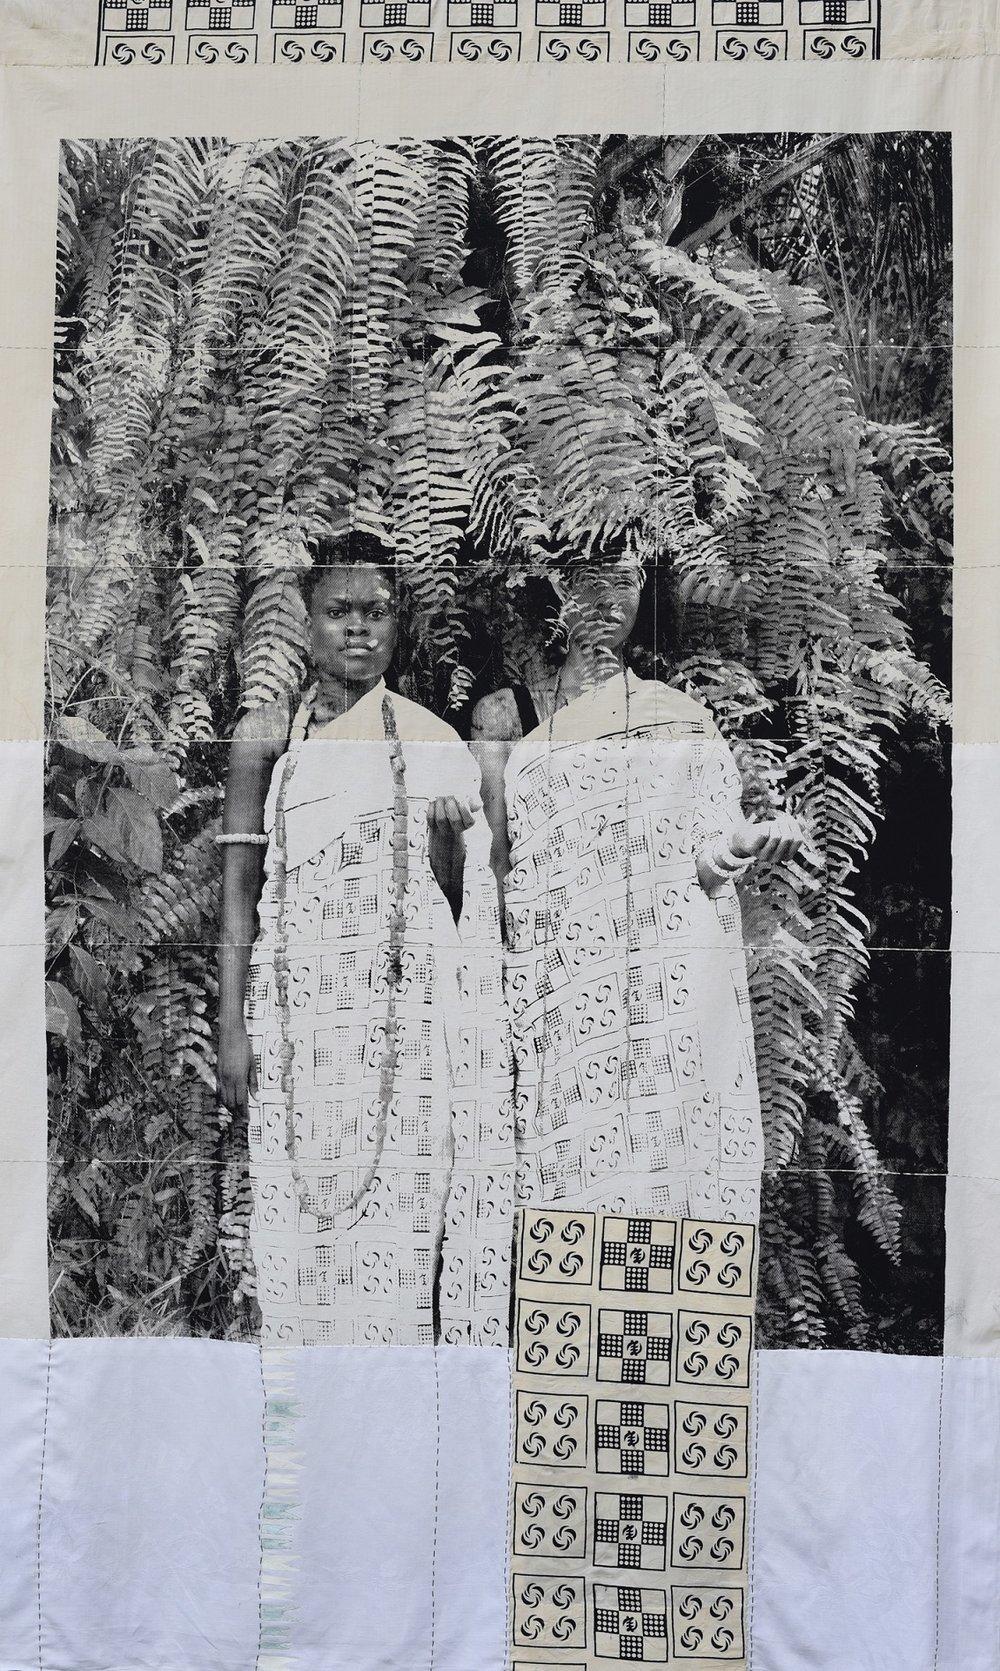 Zohra Opoku, Debie, 2017, Courtesy of Zohra Opoku and Mariane Ibrahim Gallery.jpg